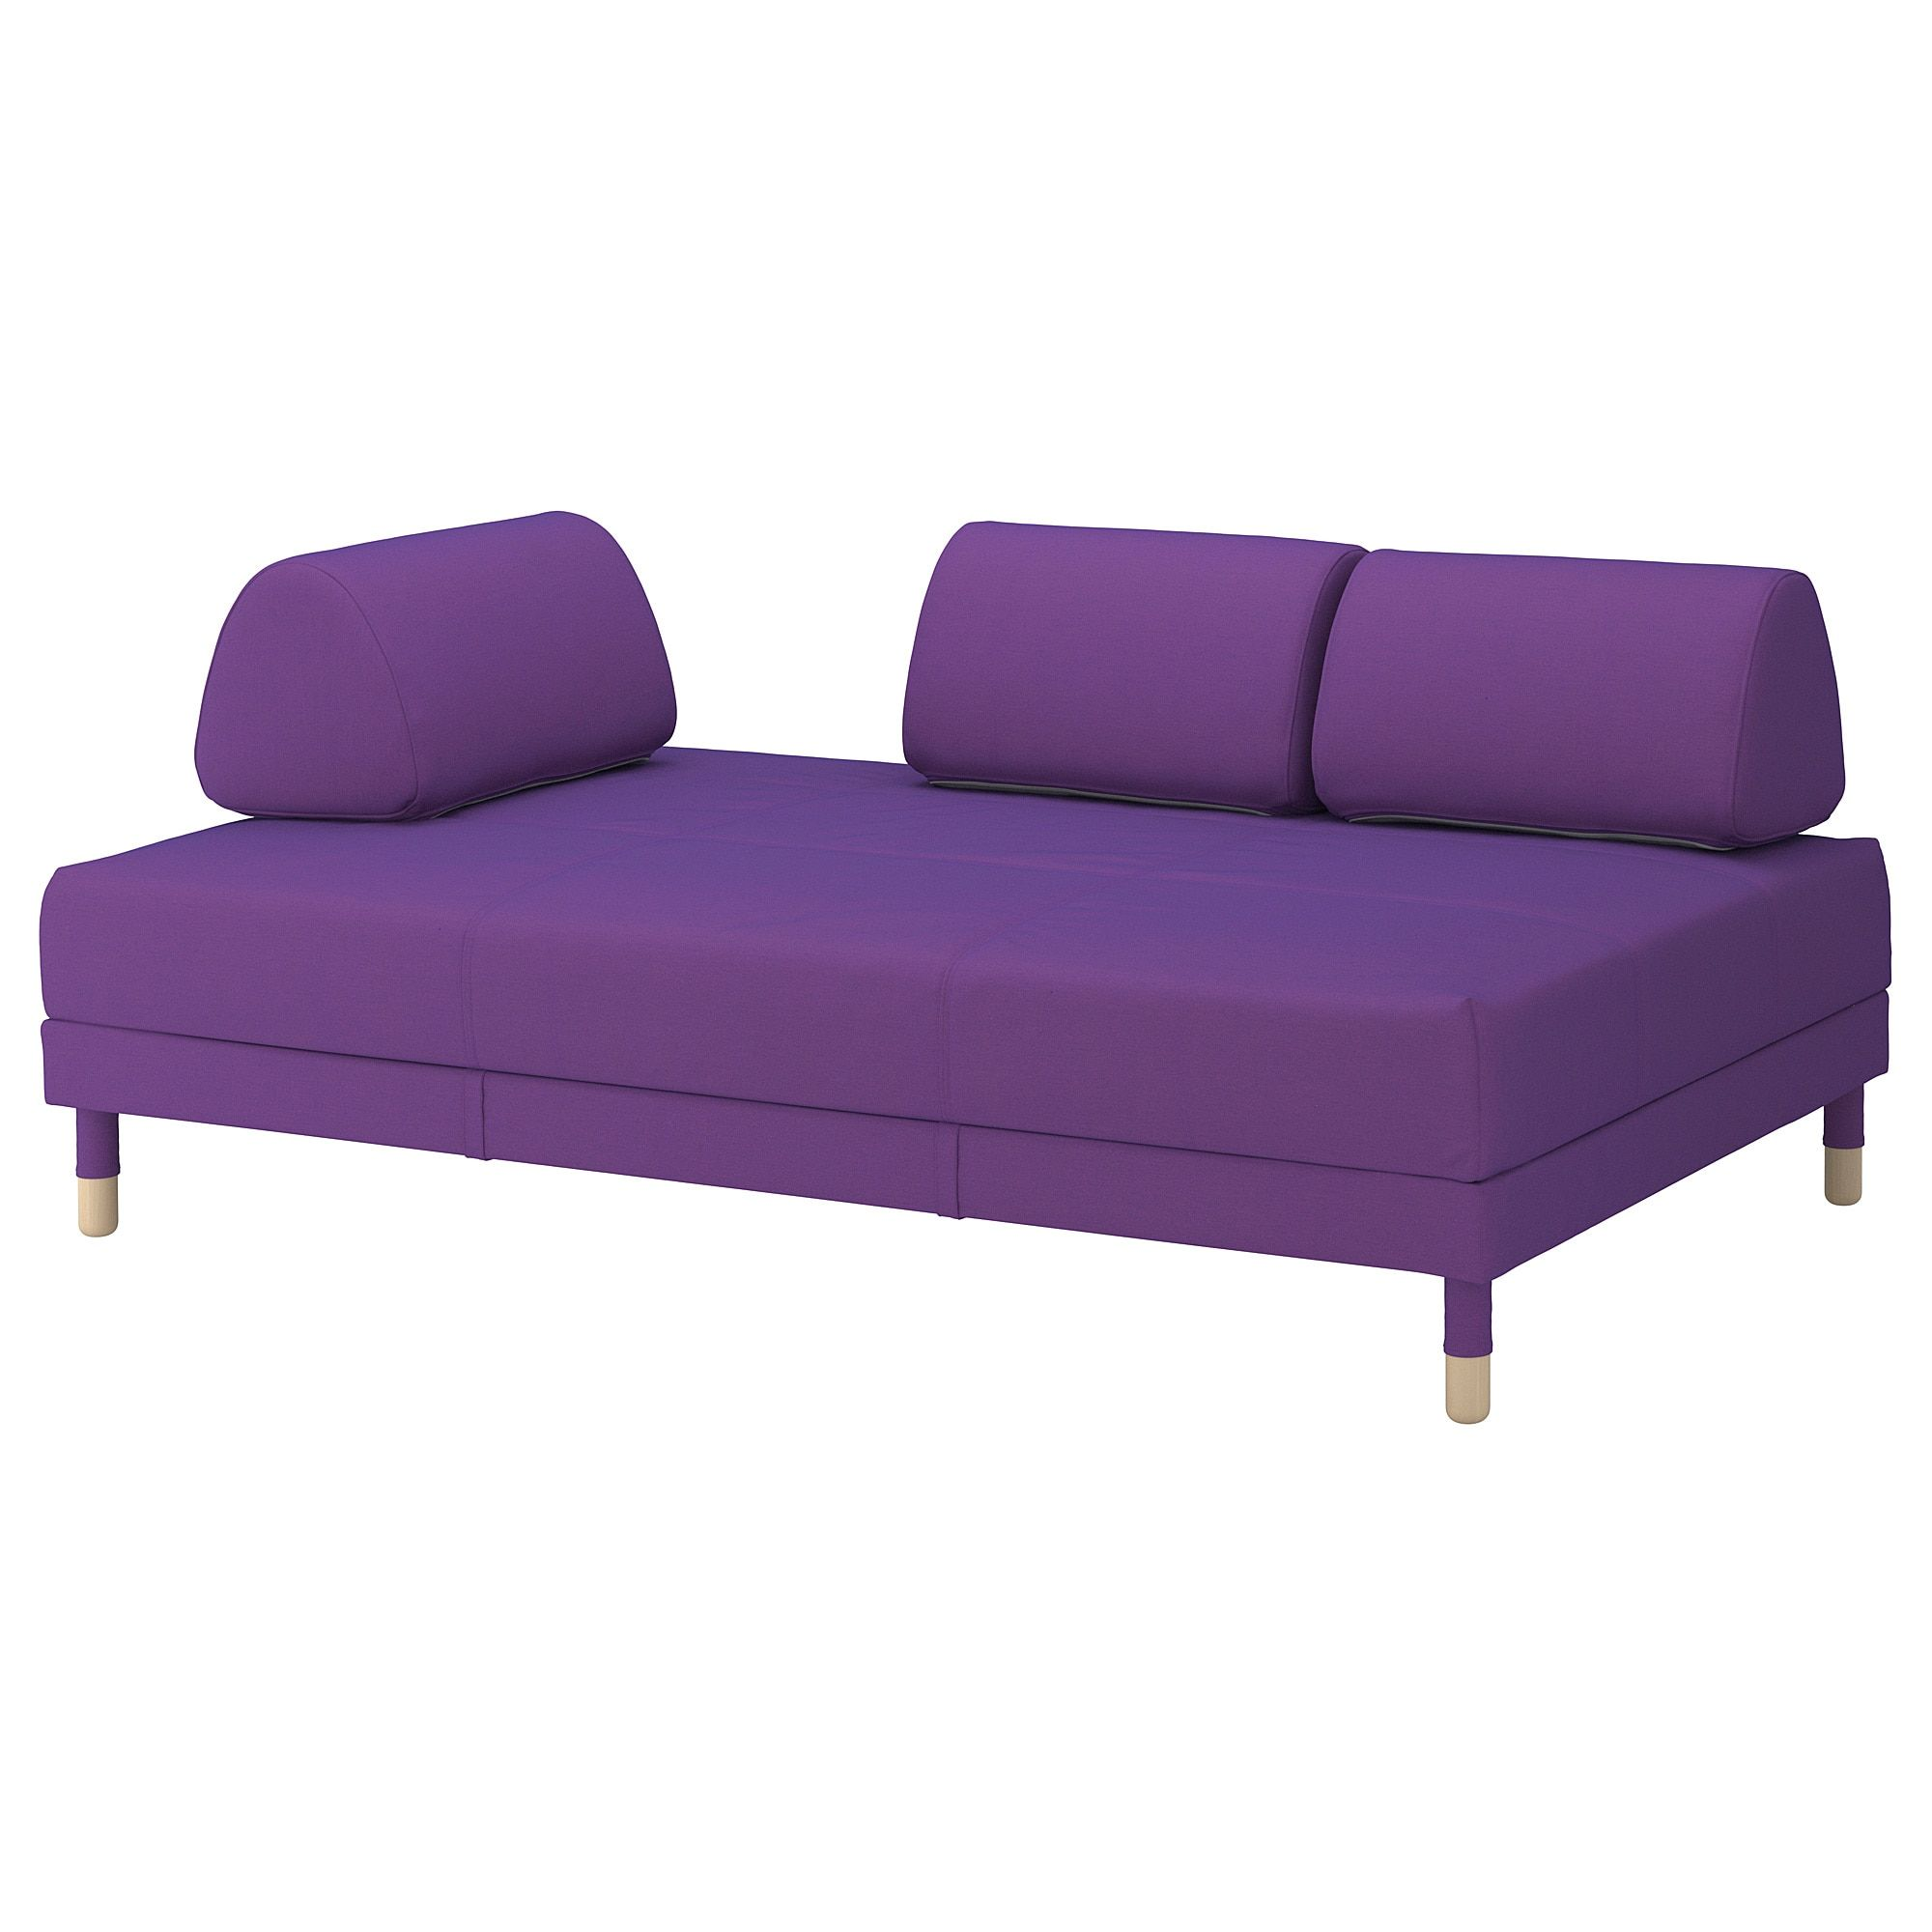 - FLOTTEBO Bettsofa - Vissle Lila - IKEA Deutschland Sofa, Sleeper